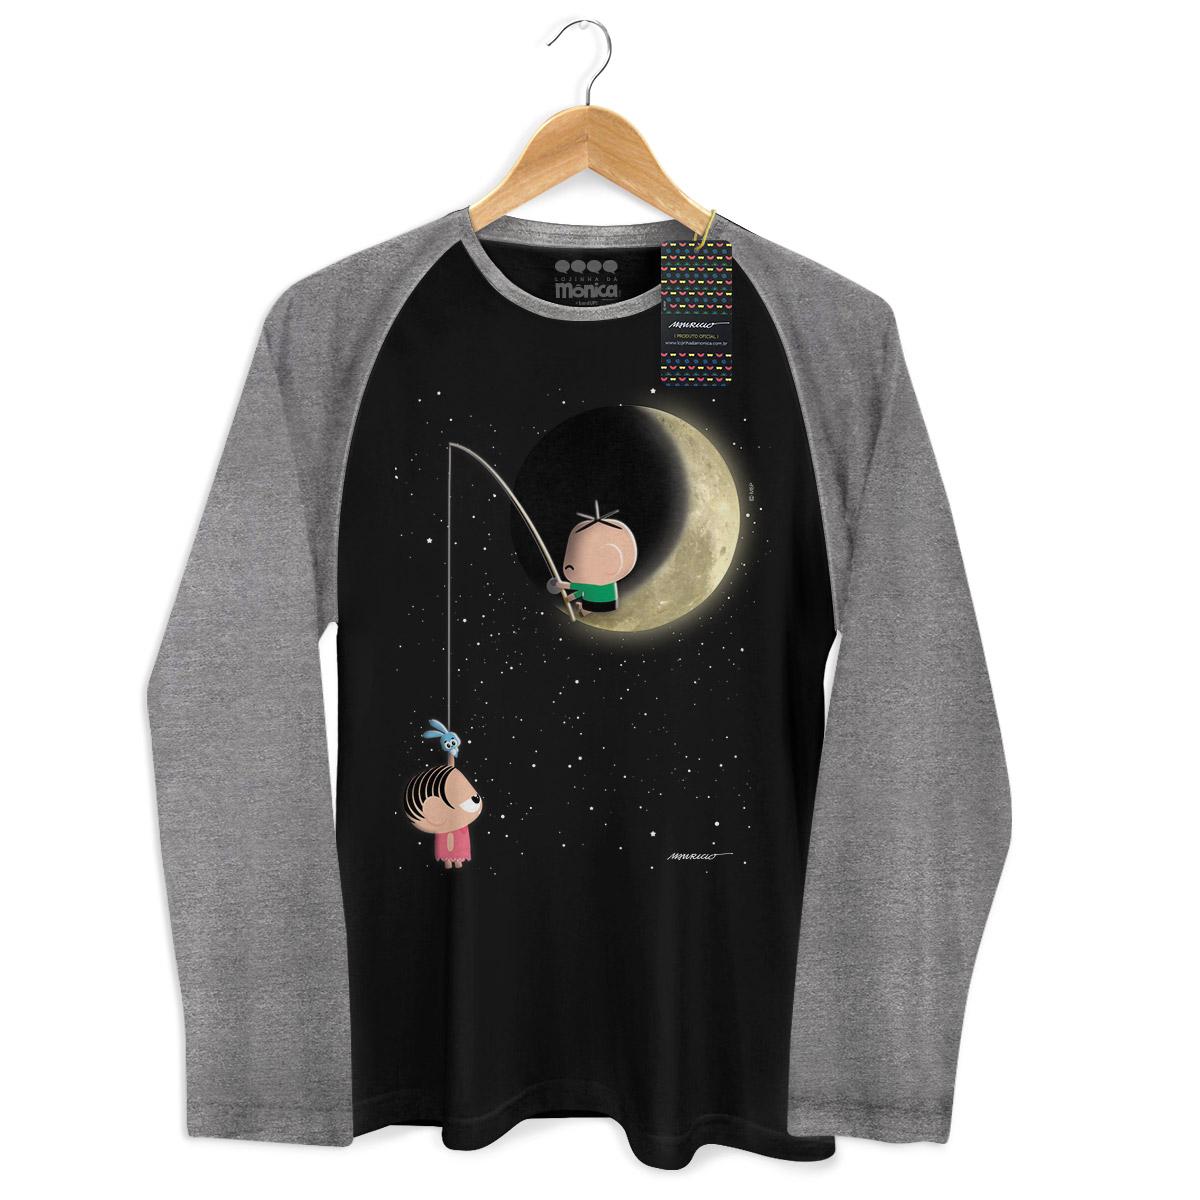 Camiseta Raglan Masculina Turma da Mônica Toy Lua